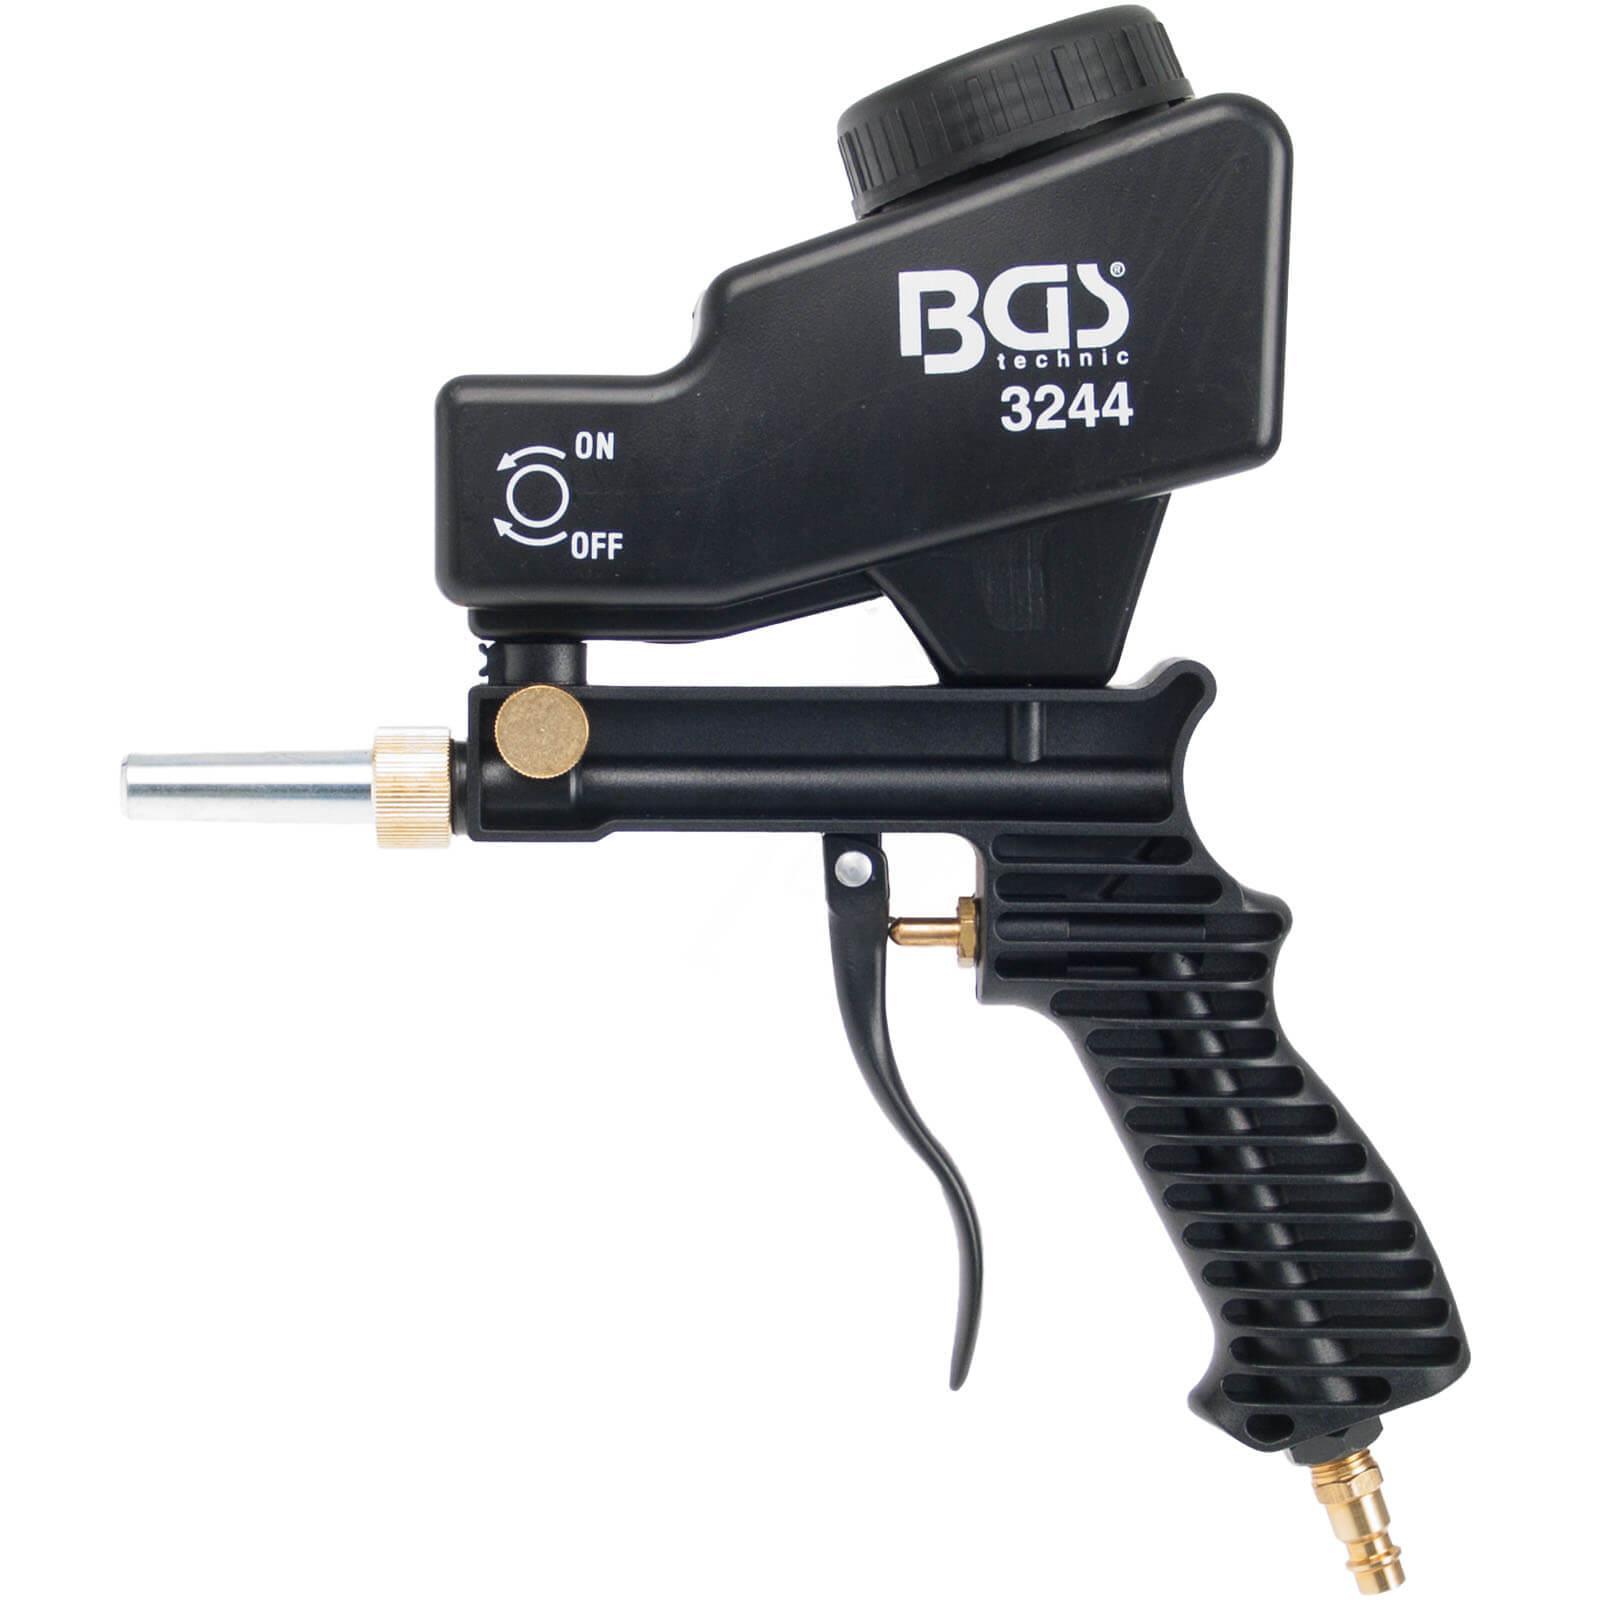 pneumatique sableuse pistolet de sablage d capage au sable. Black Bedroom Furniture Sets. Home Design Ideas